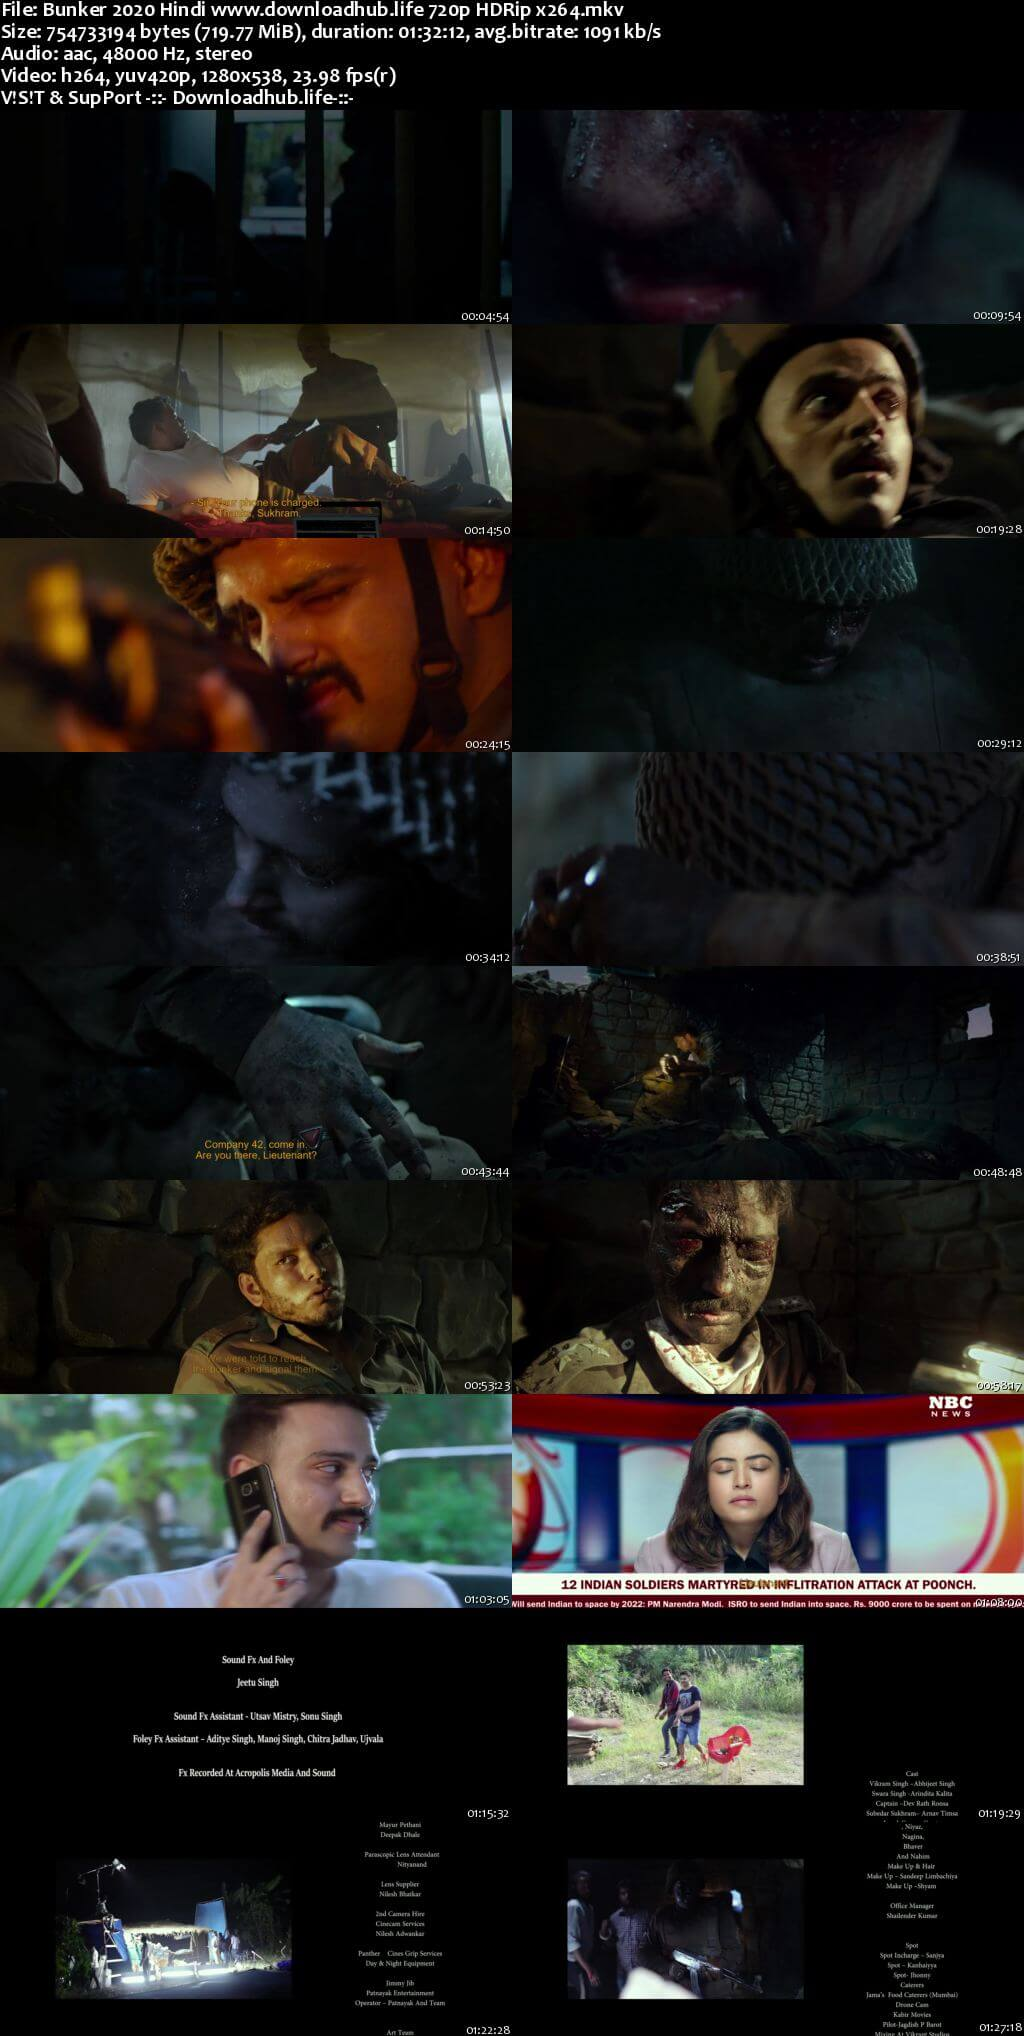 Bunker 2020 Hindi 720p HDRip x264